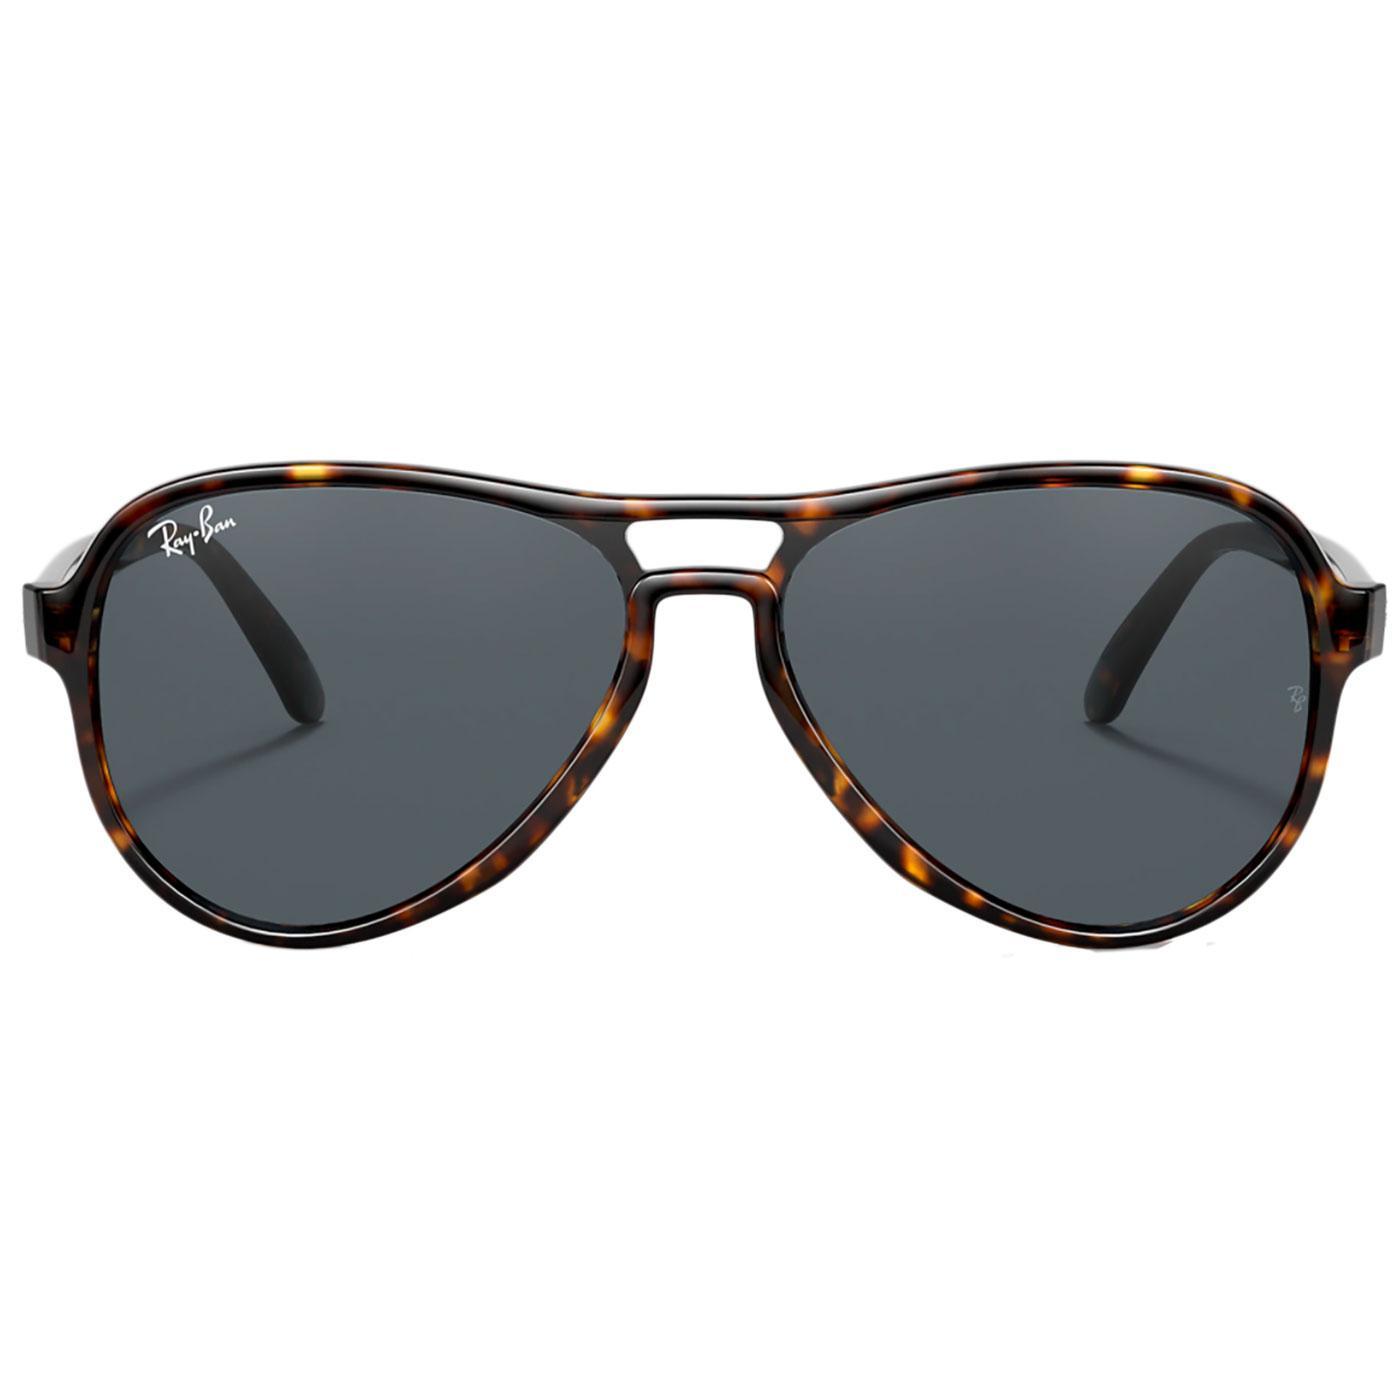 Vagabond RAY-BAN Retro 70s Aviator Sunglasses HB